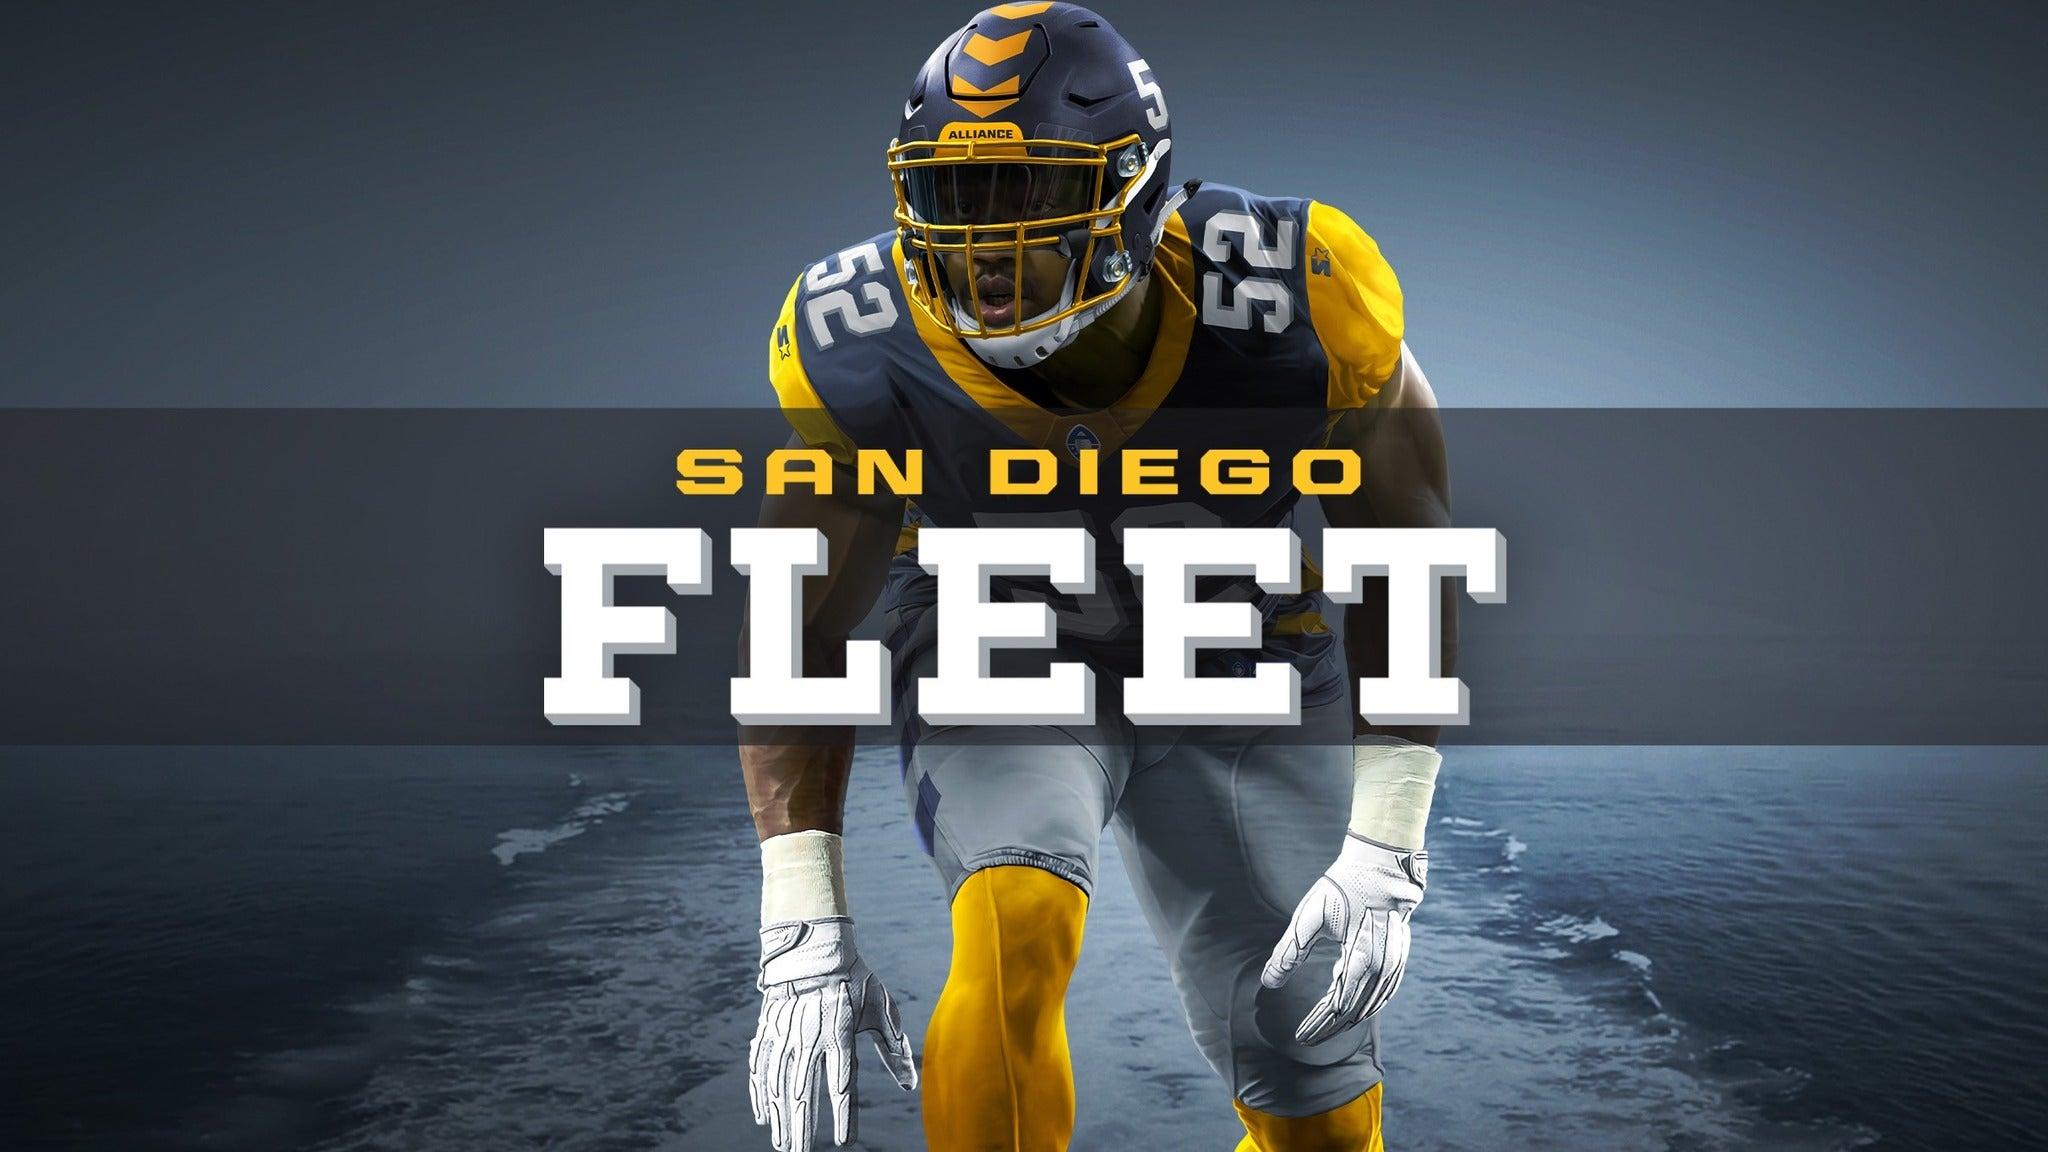 San Diego Fleet 2 Game Pack